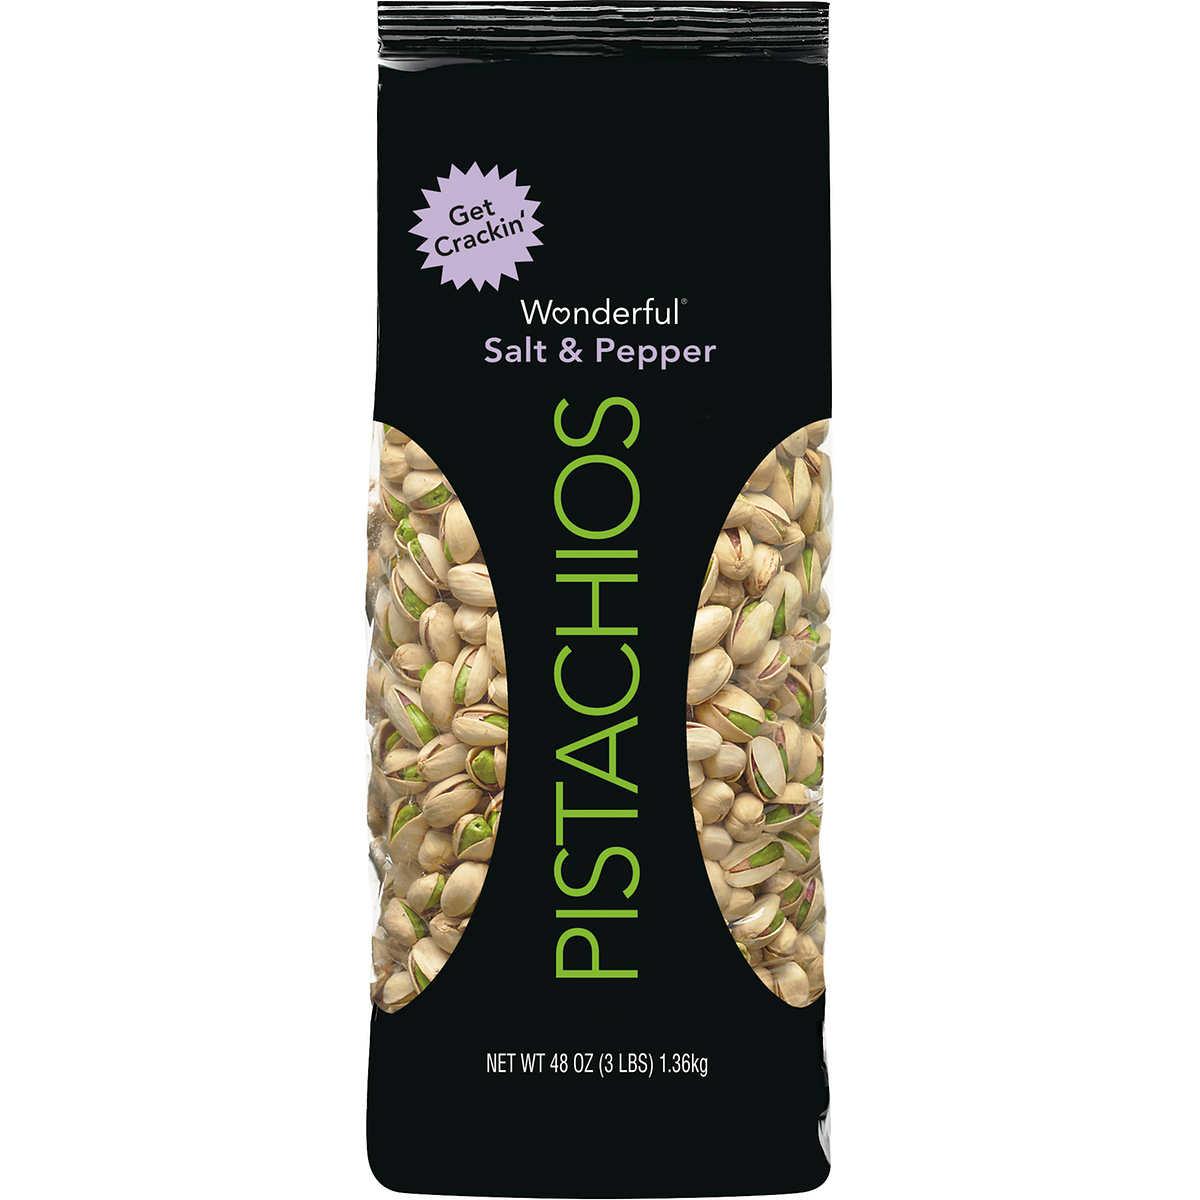 Salt and pepper pistachios